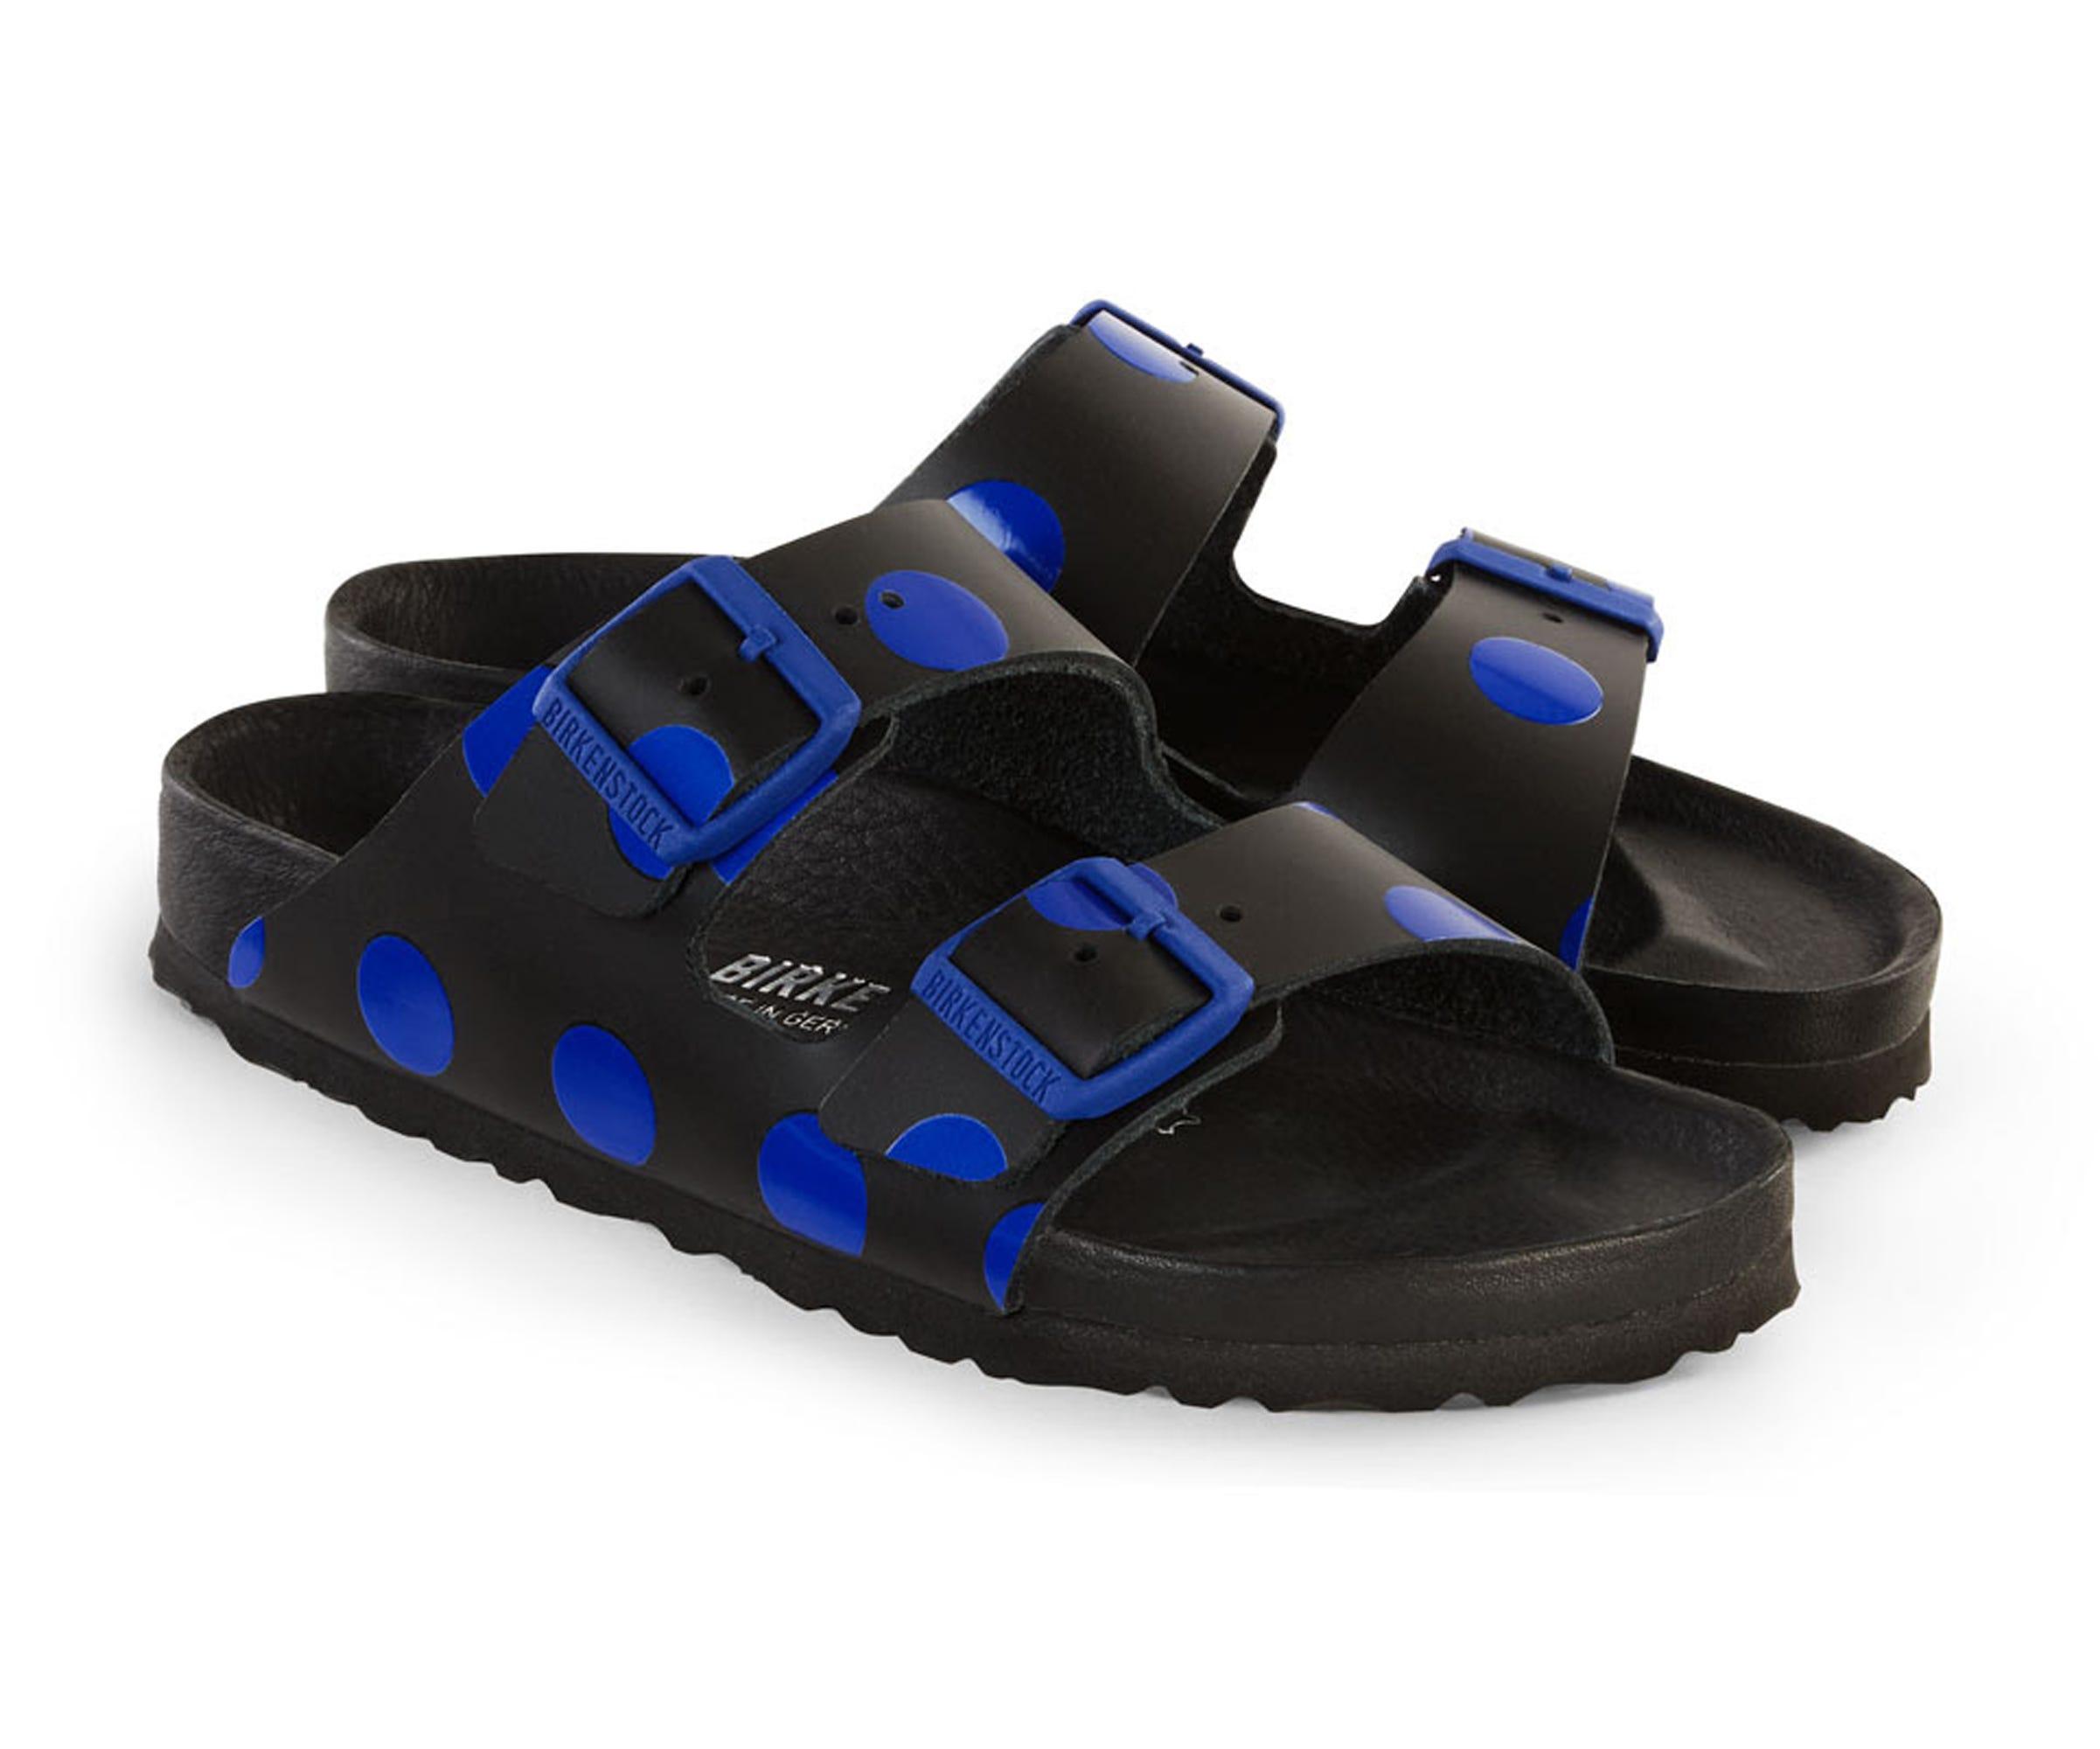 Birkenstock Colette Shoe Collection New Sandals Styles